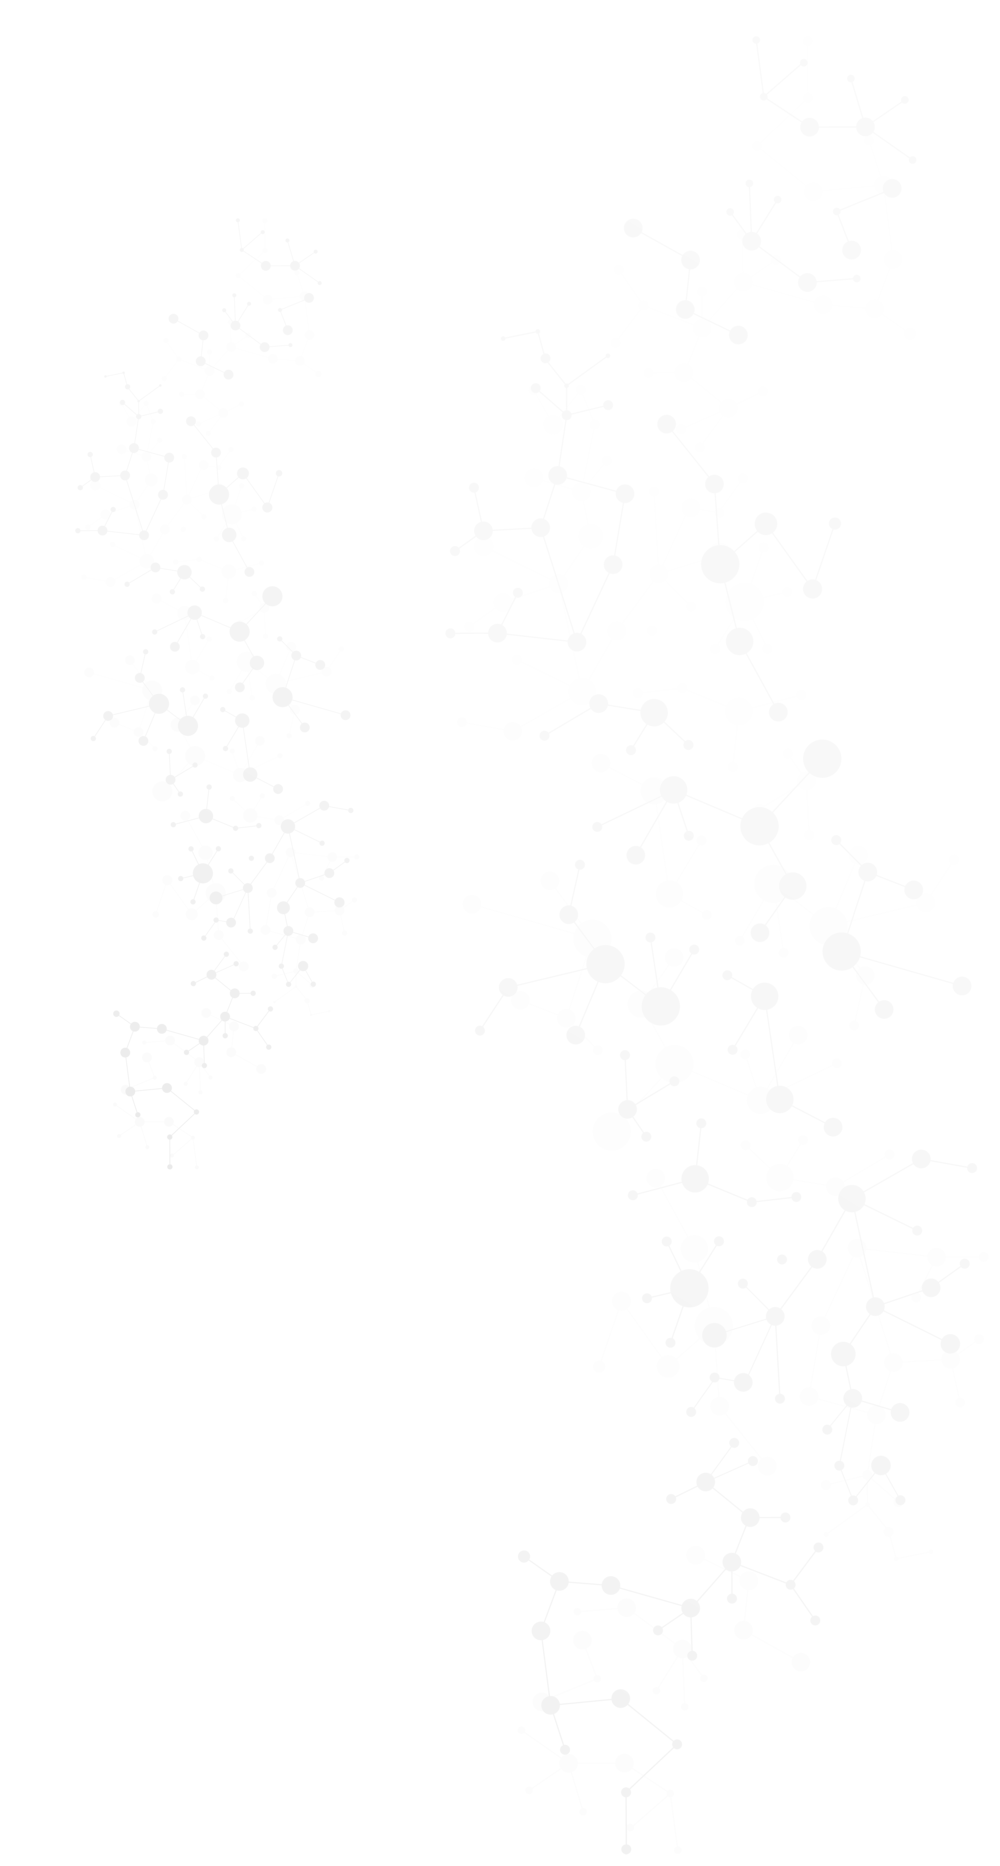 Molecule_bg copy.png